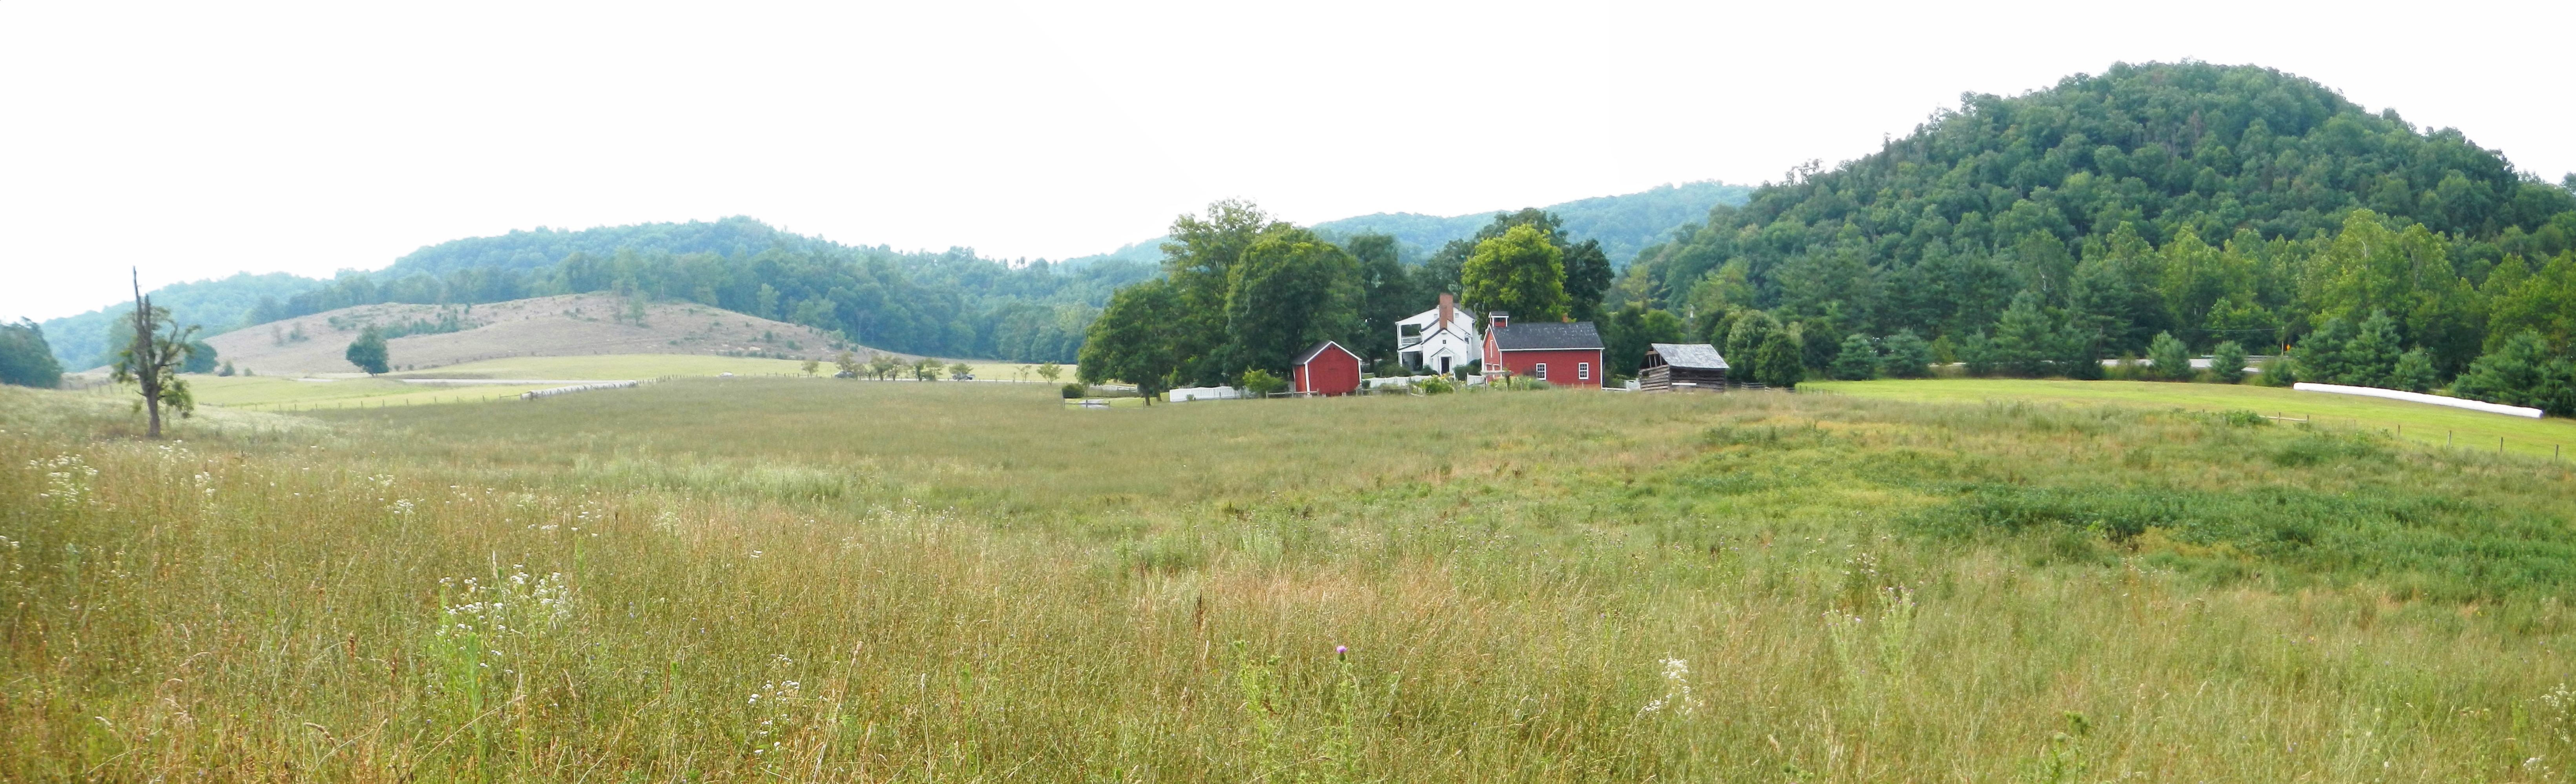 Monroe County Farm